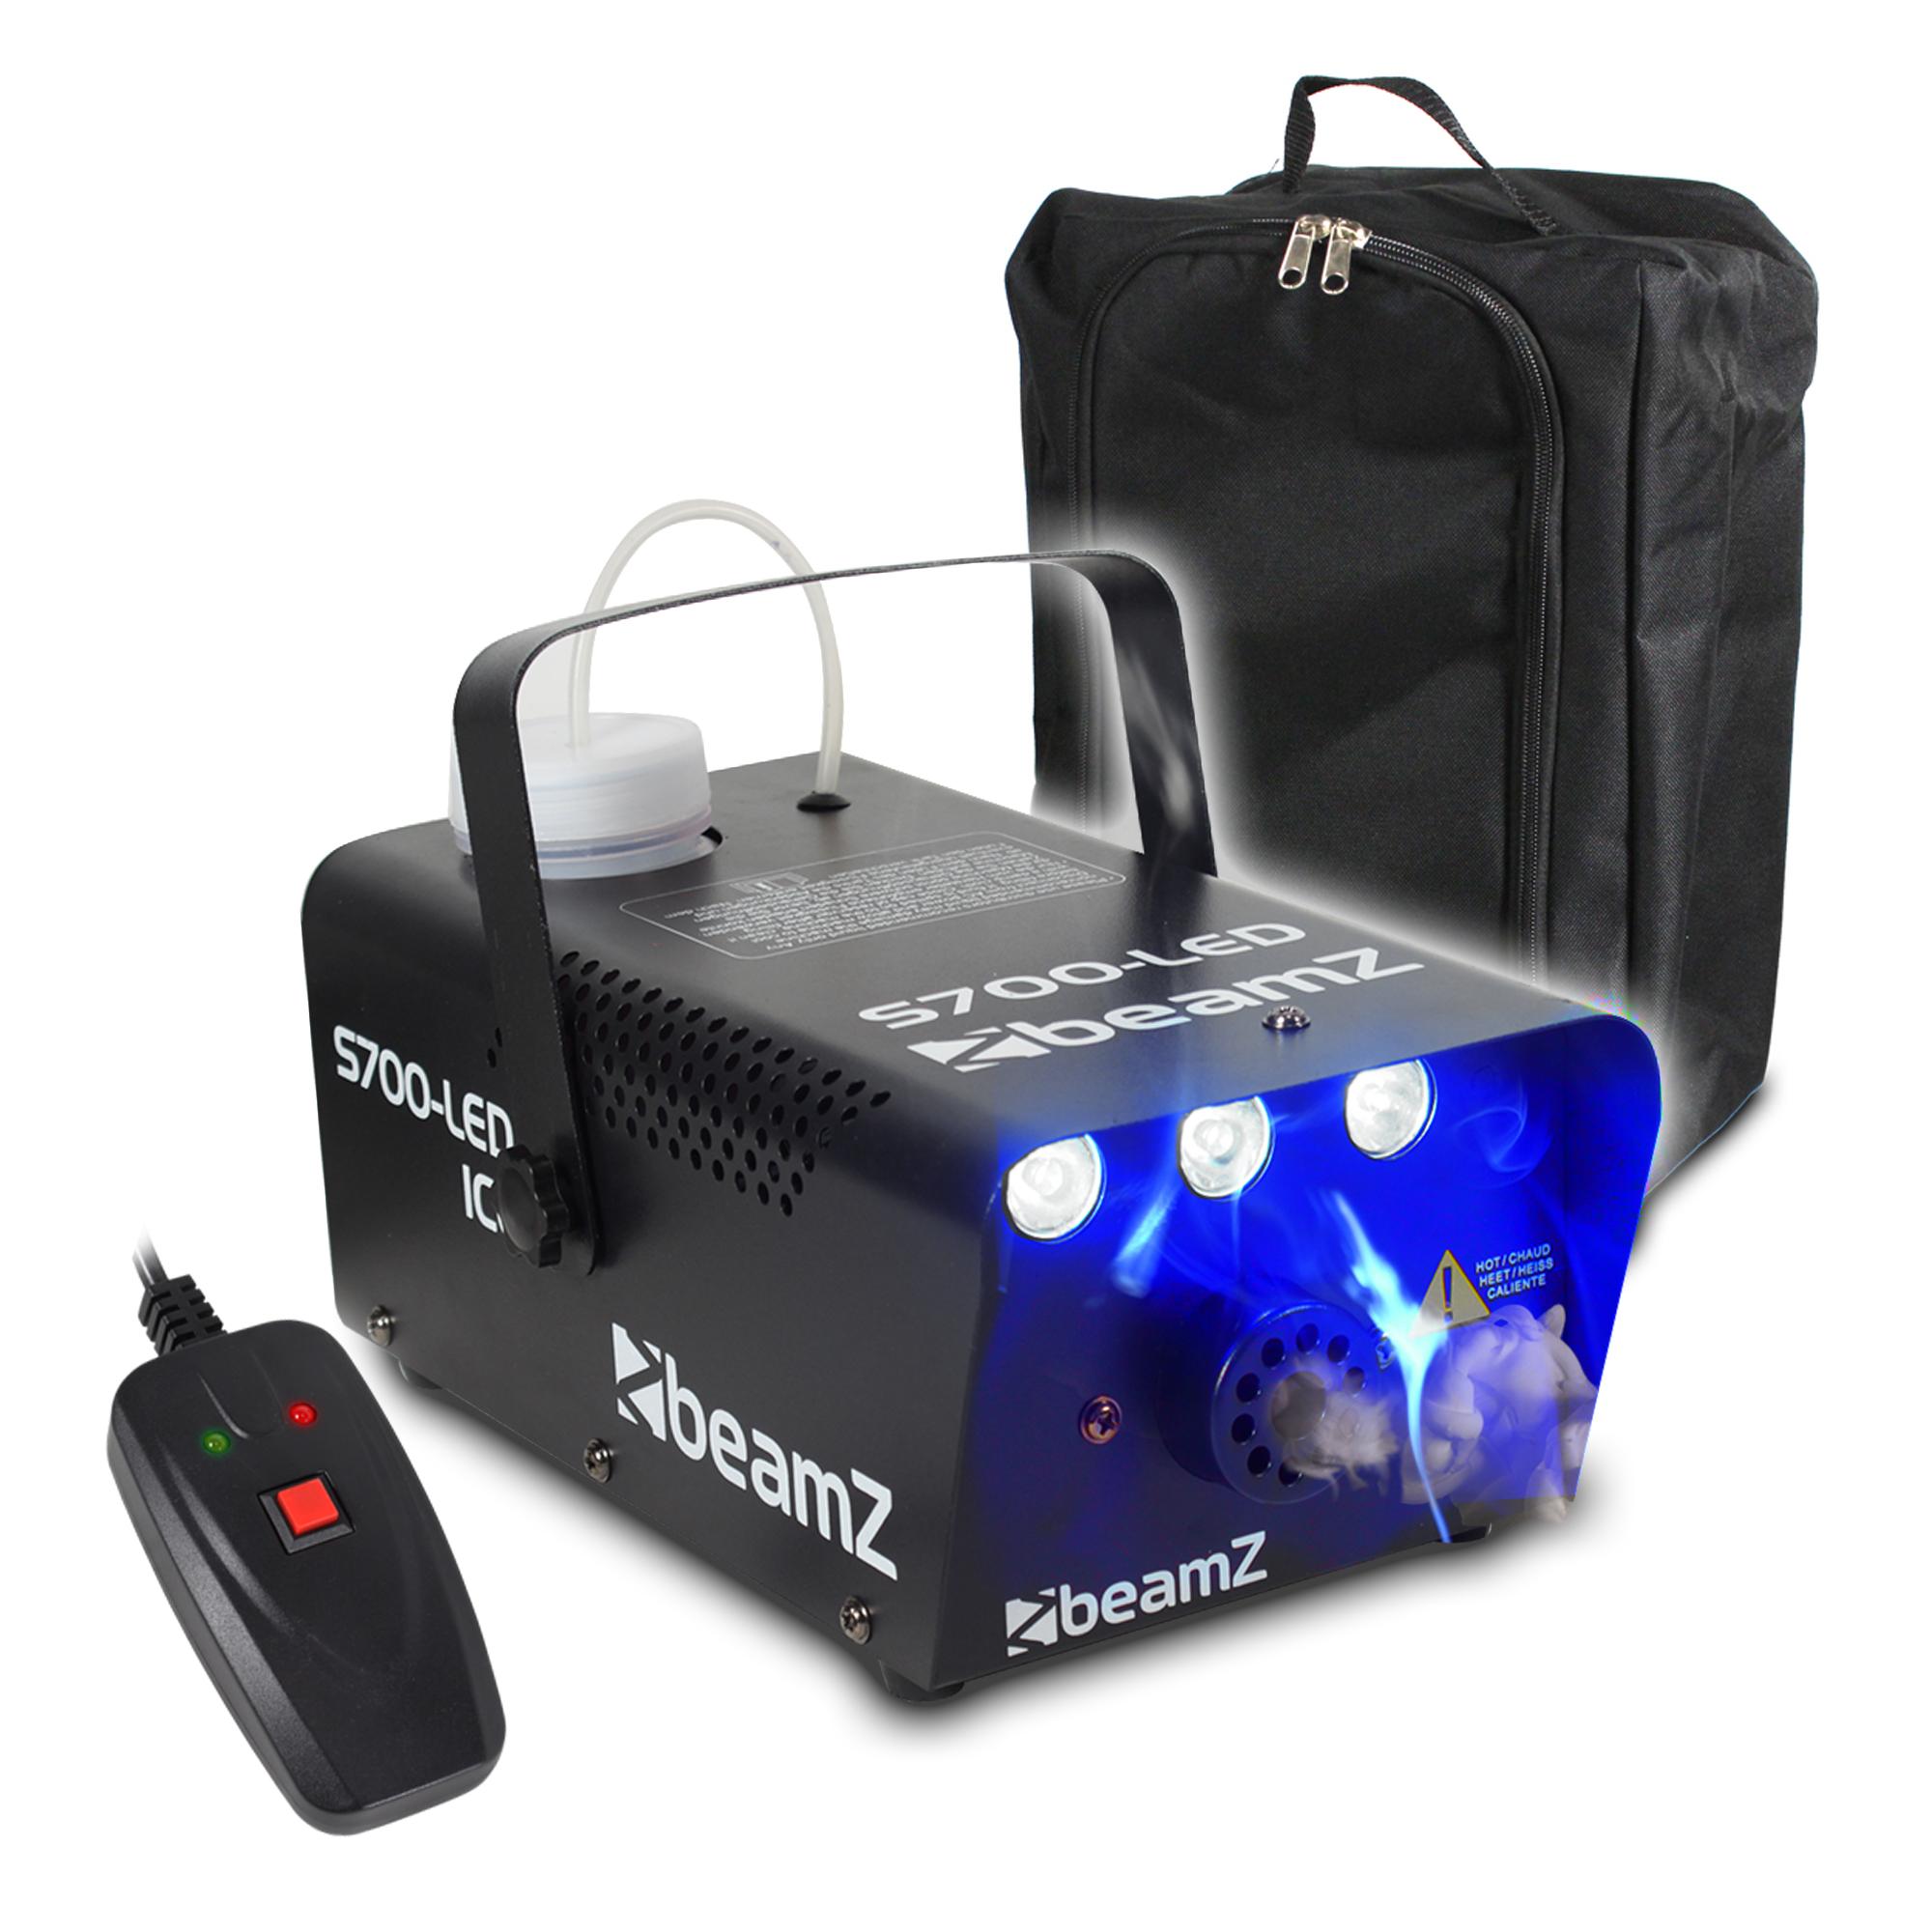 BeamZ S700-LED Ice Effect Smoke Machine & Gear Sack